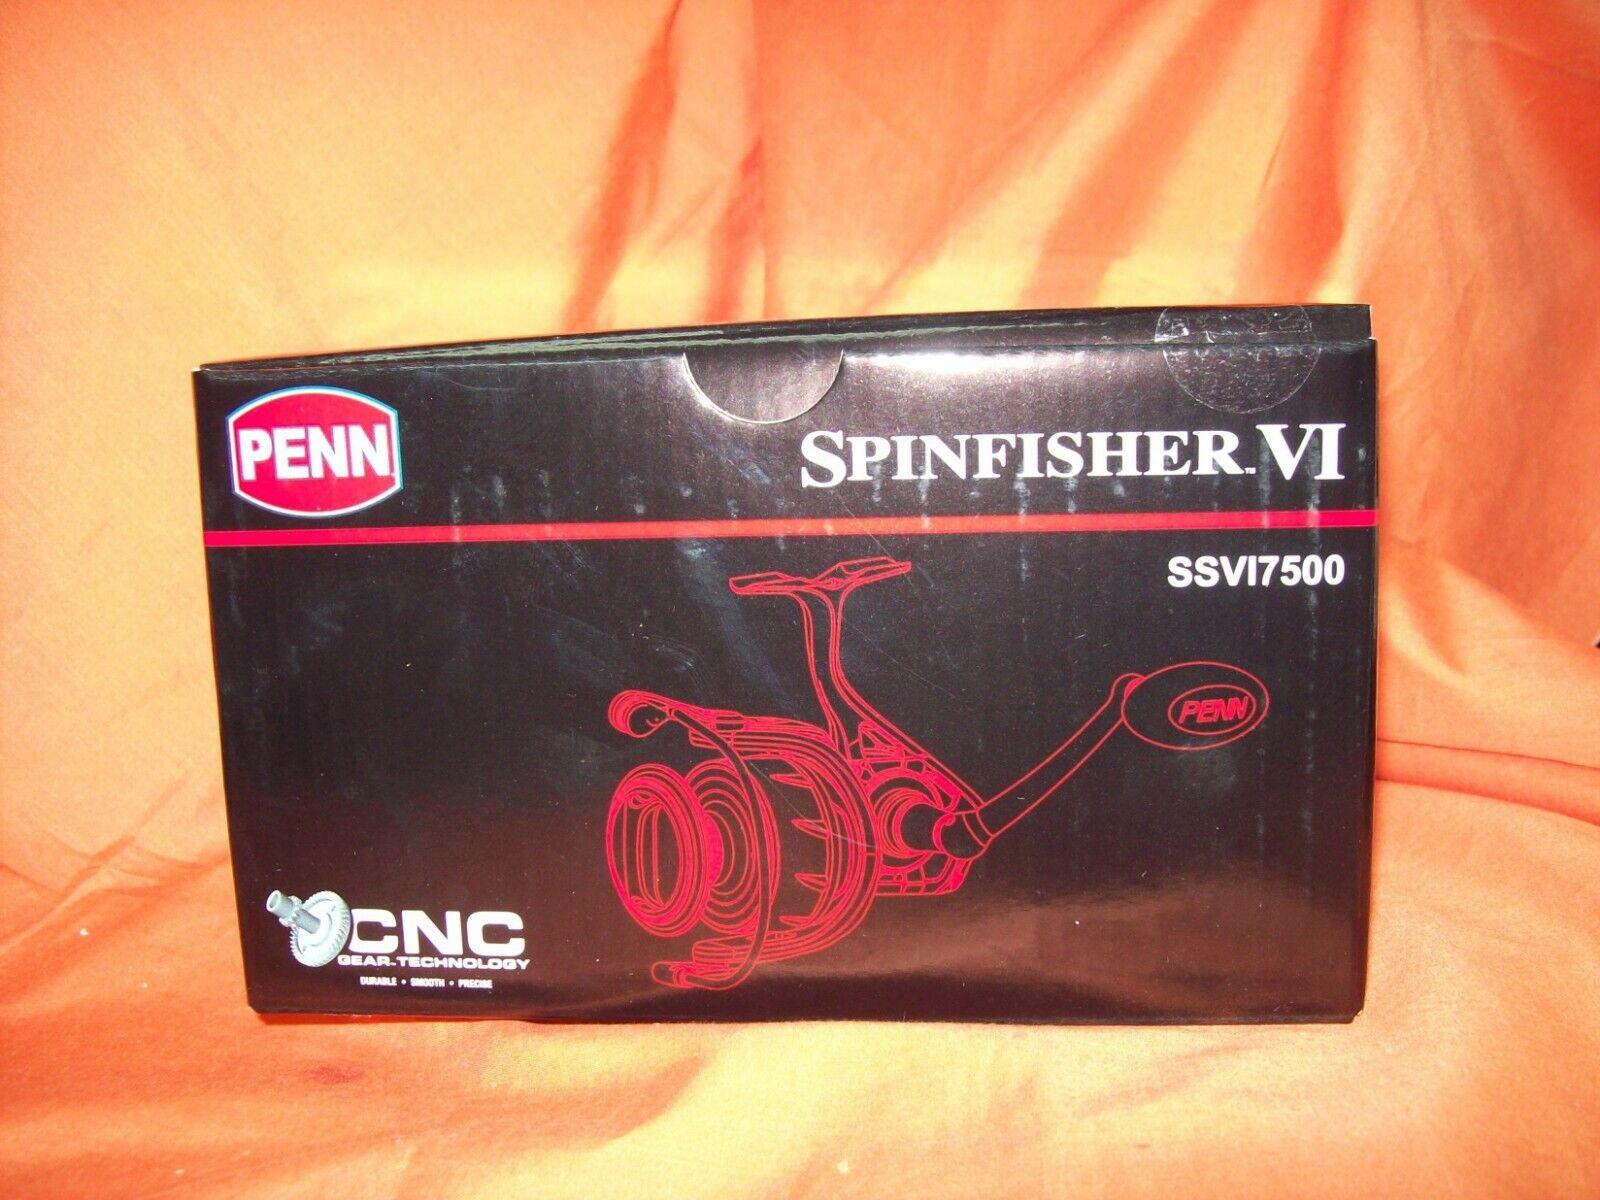 PENN SPINFISHER VI 7500 Spinning Reel Gear Ratio 4.7 1  1481265 SSVI7500